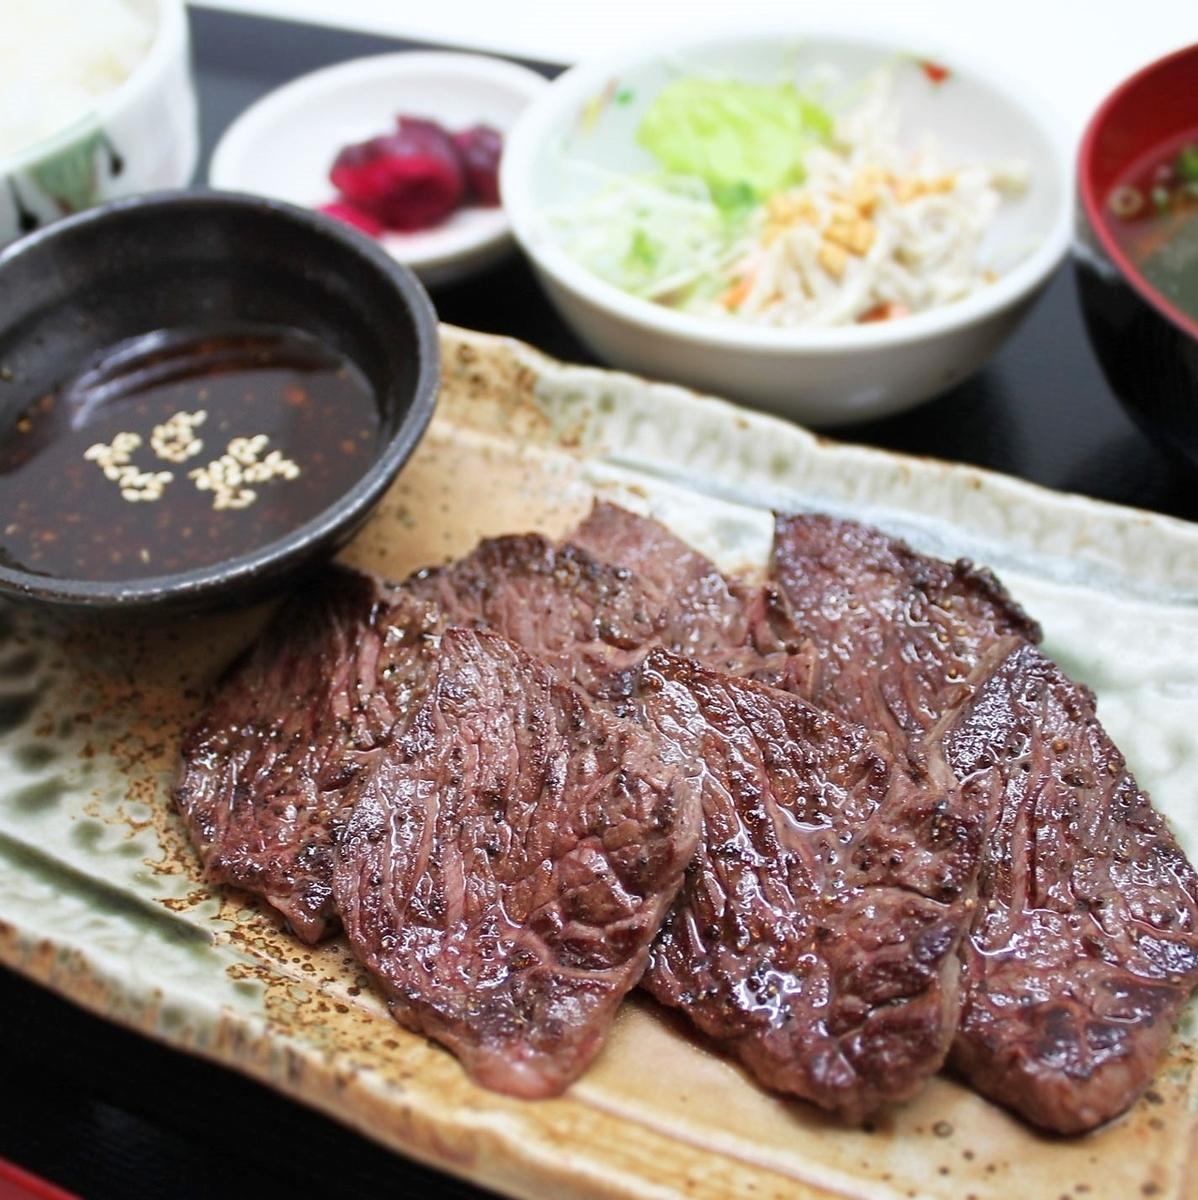 牛肉harami肉集合膳食